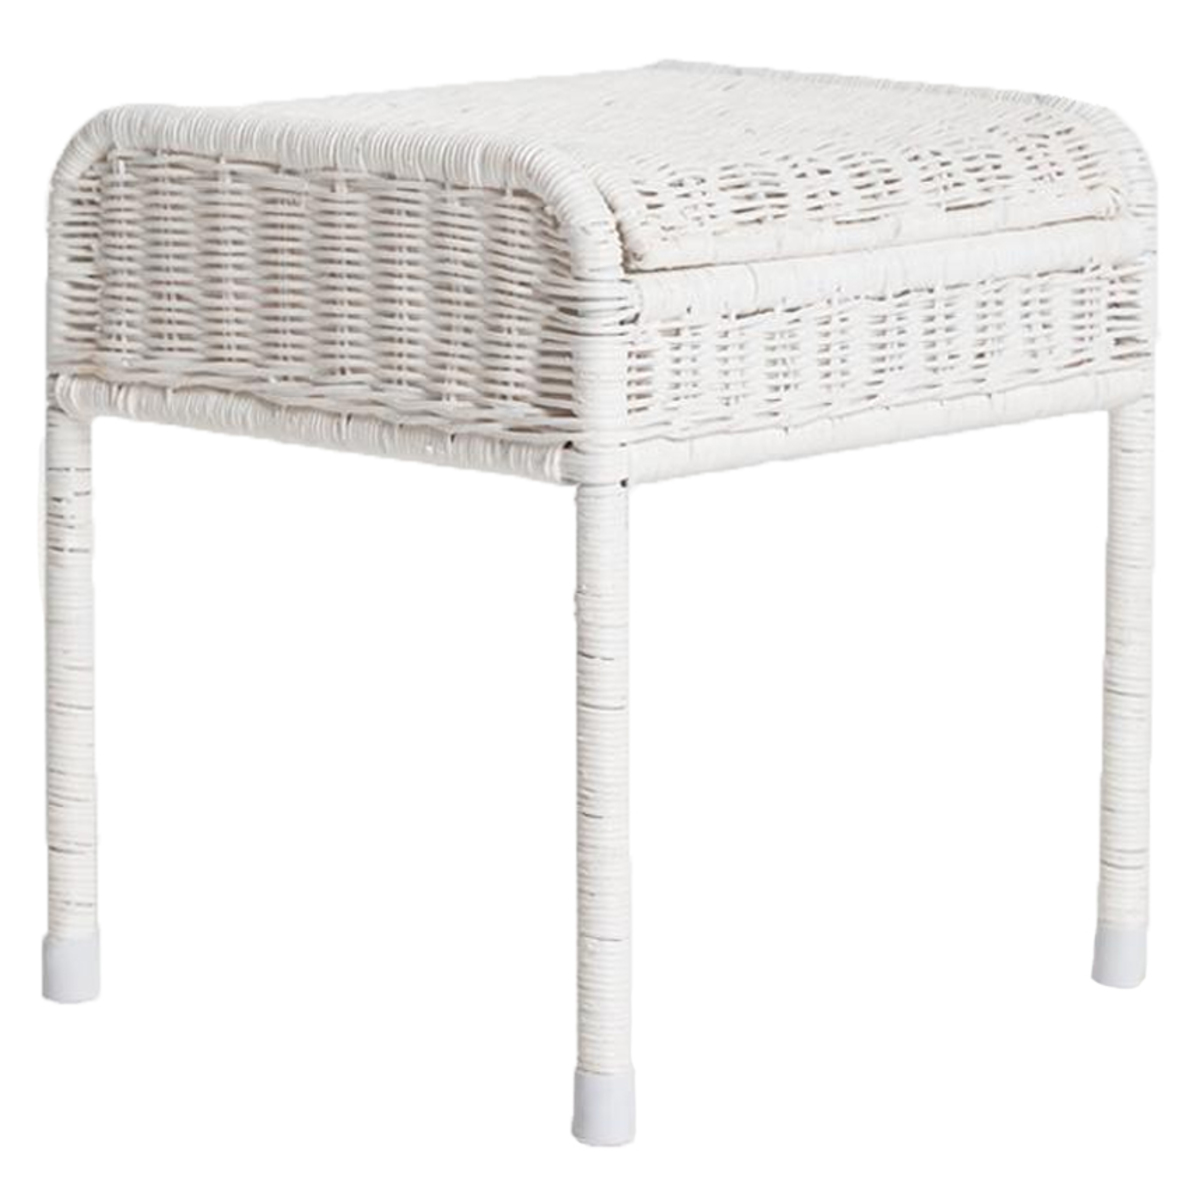 Table & Chaise Bureau Coffre Enfant en Rotin - Blanc